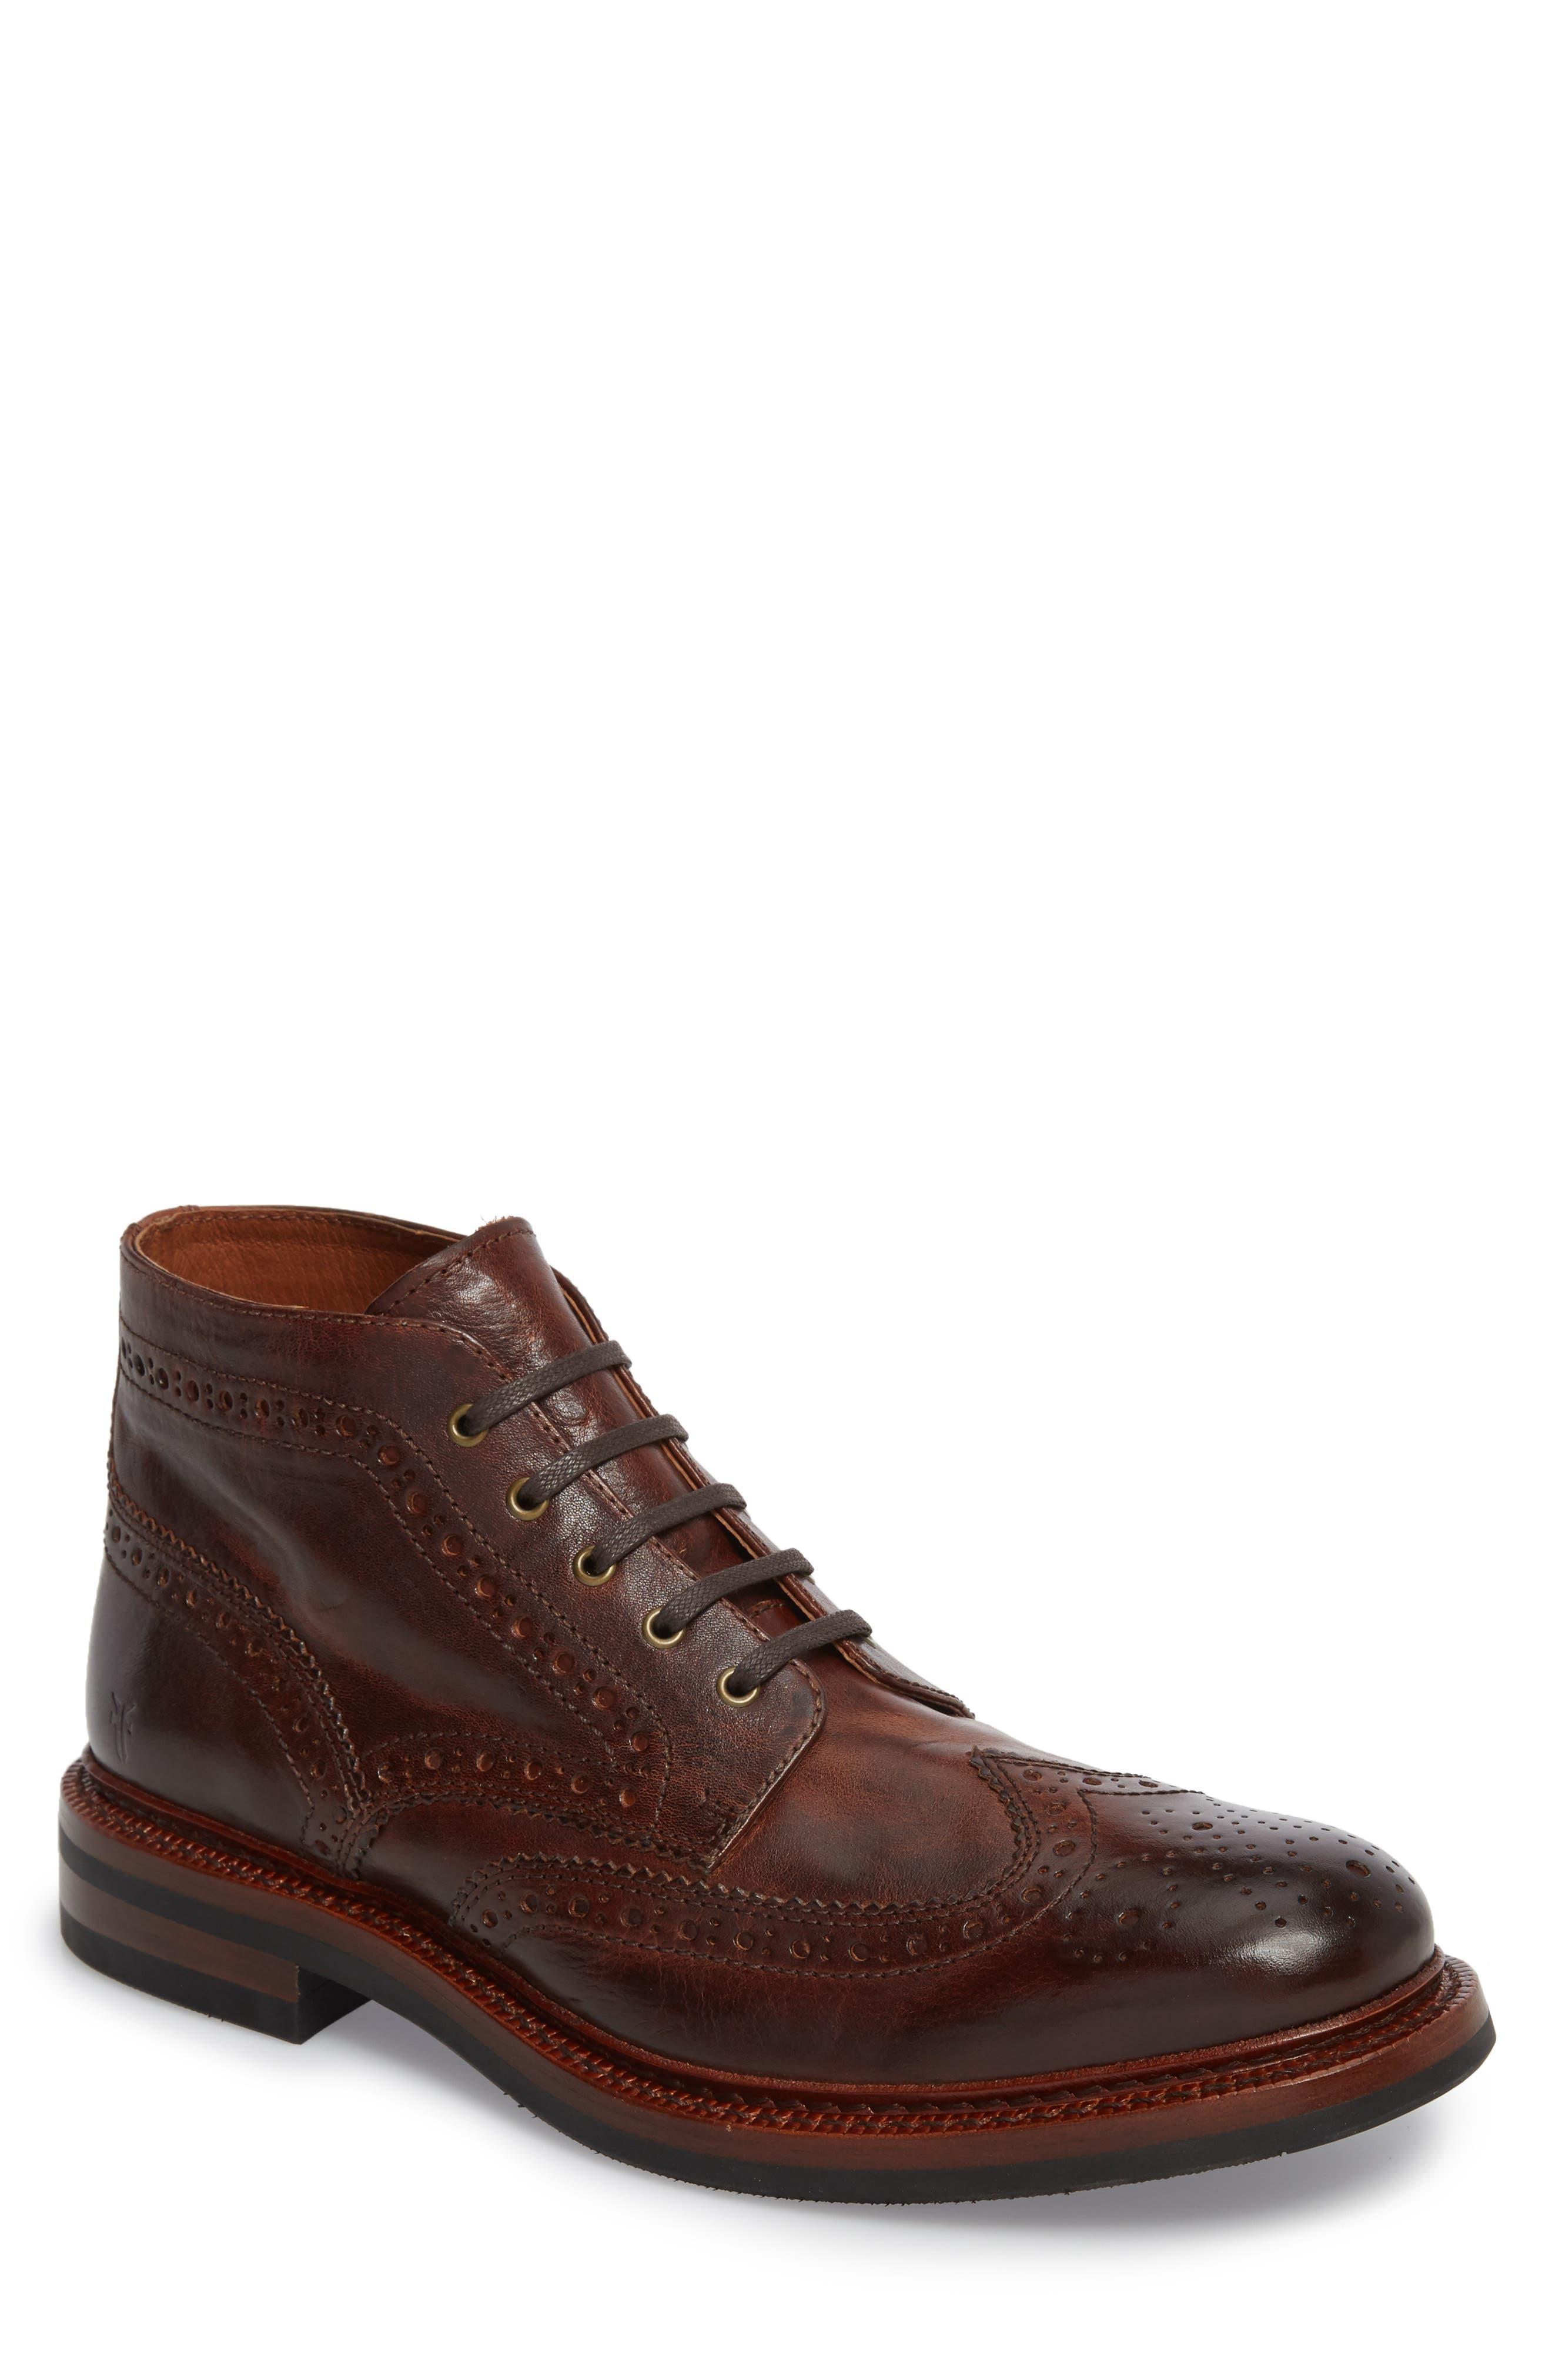 Graham Wingtip Boot,                             Main thumbnail 1, color,                             Cognac Leather